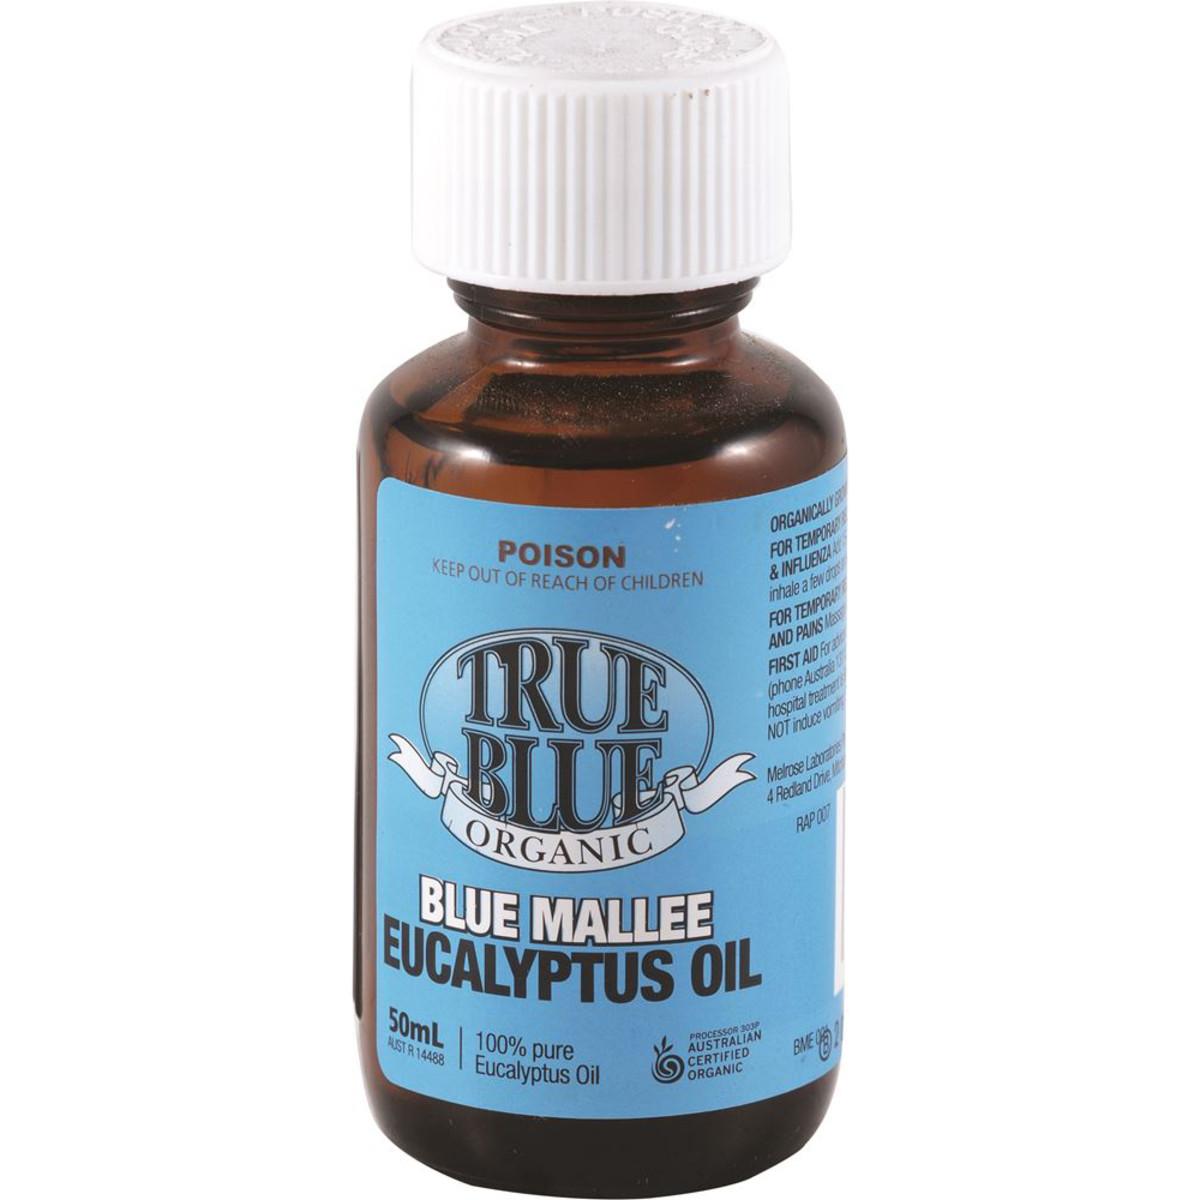 True Blue Organic Blue Mallee Eucalyptus Oil